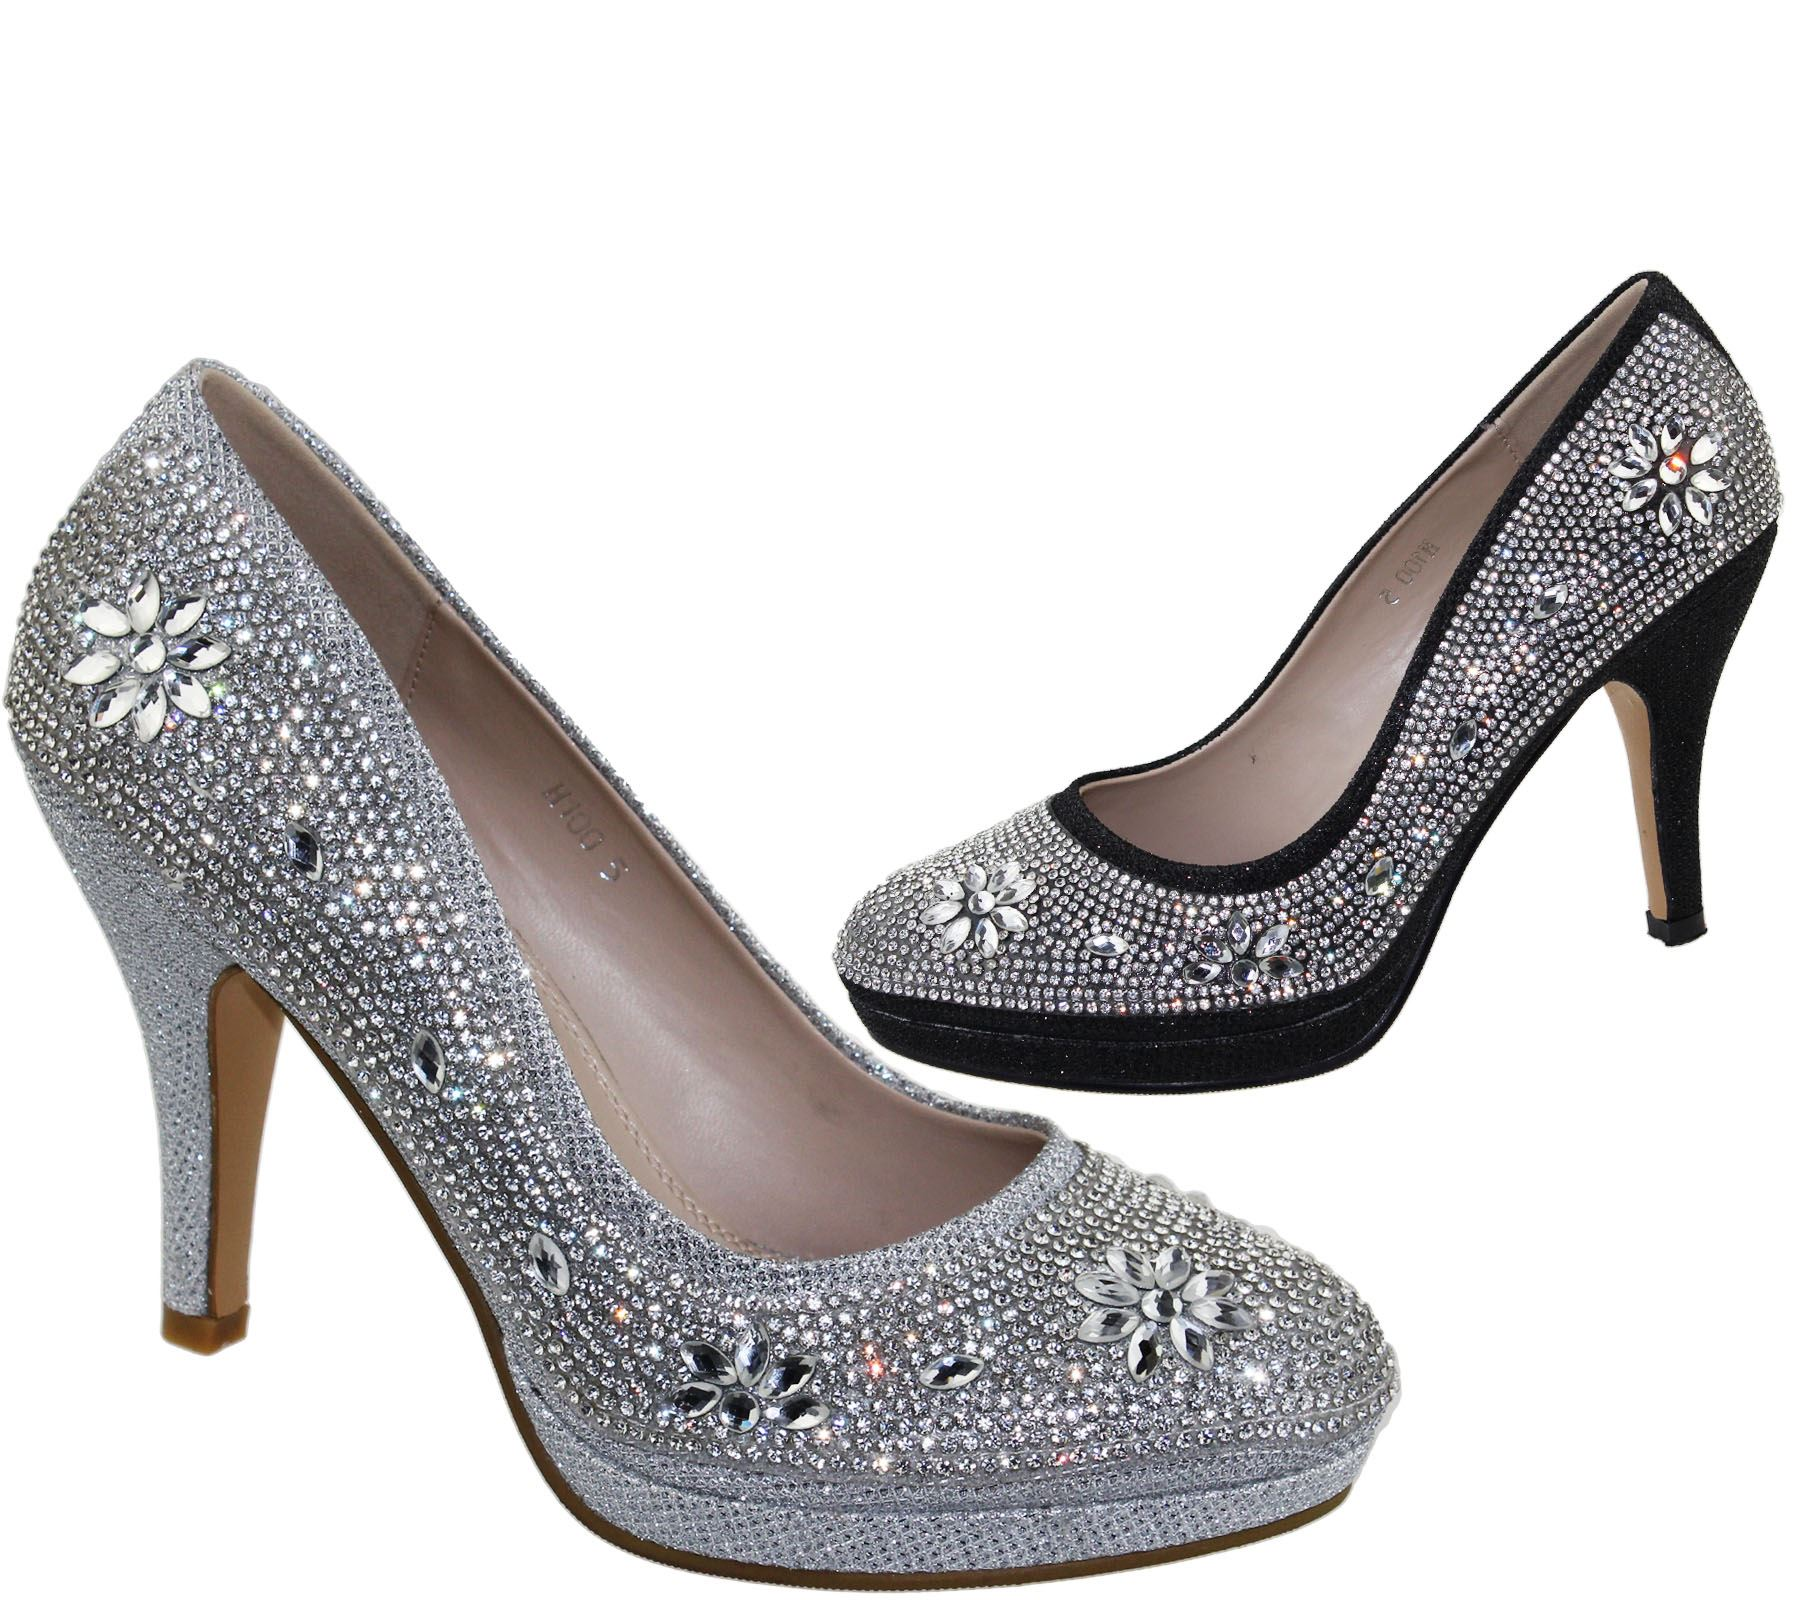 Womens-Platforms-High-Heels-Wedding-Bridal-Evening-Diamante-Ladies-Party-Shoes miniatura 21